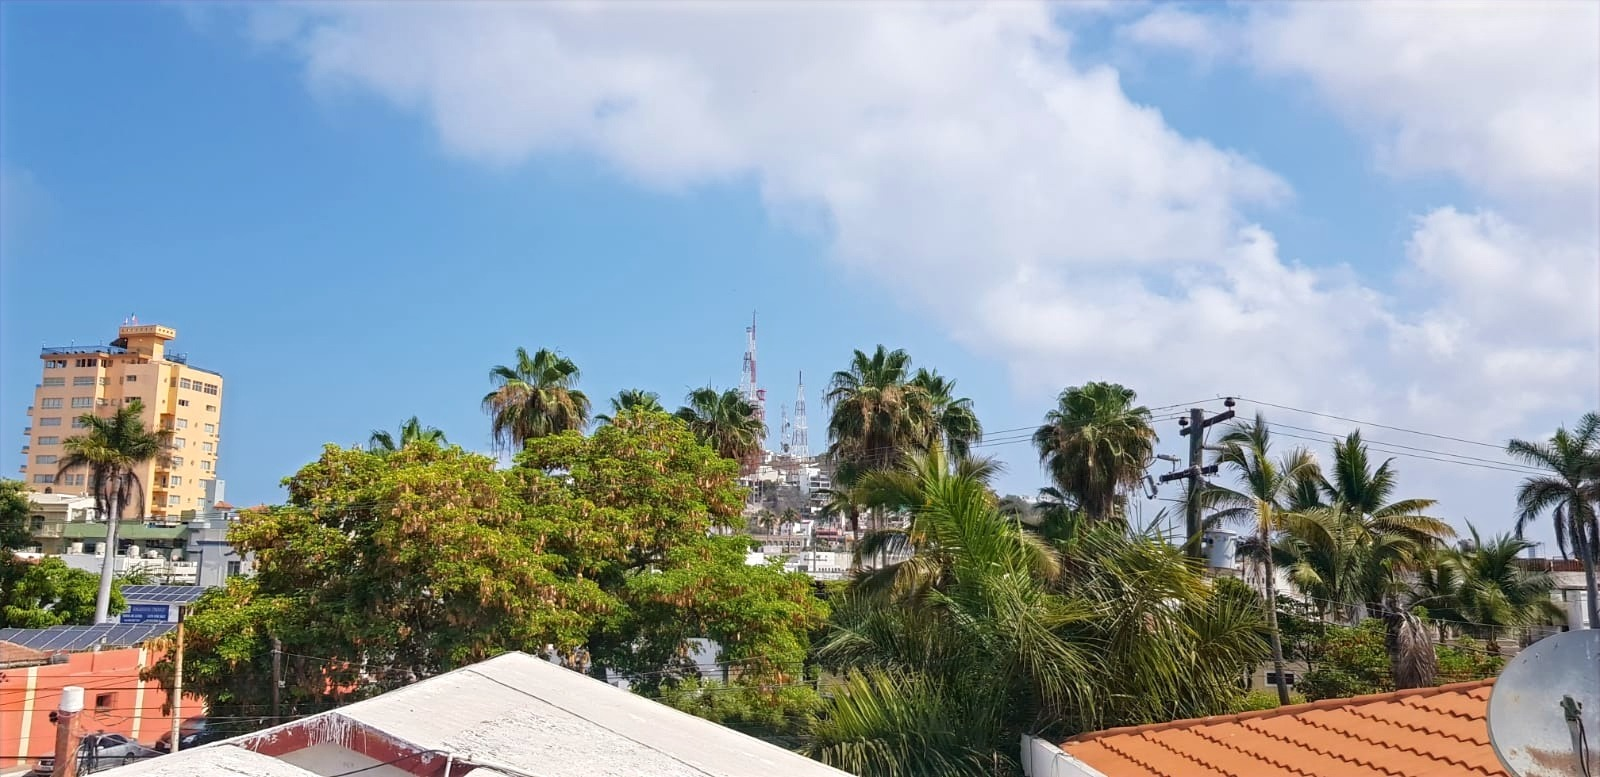 Roof-top views.